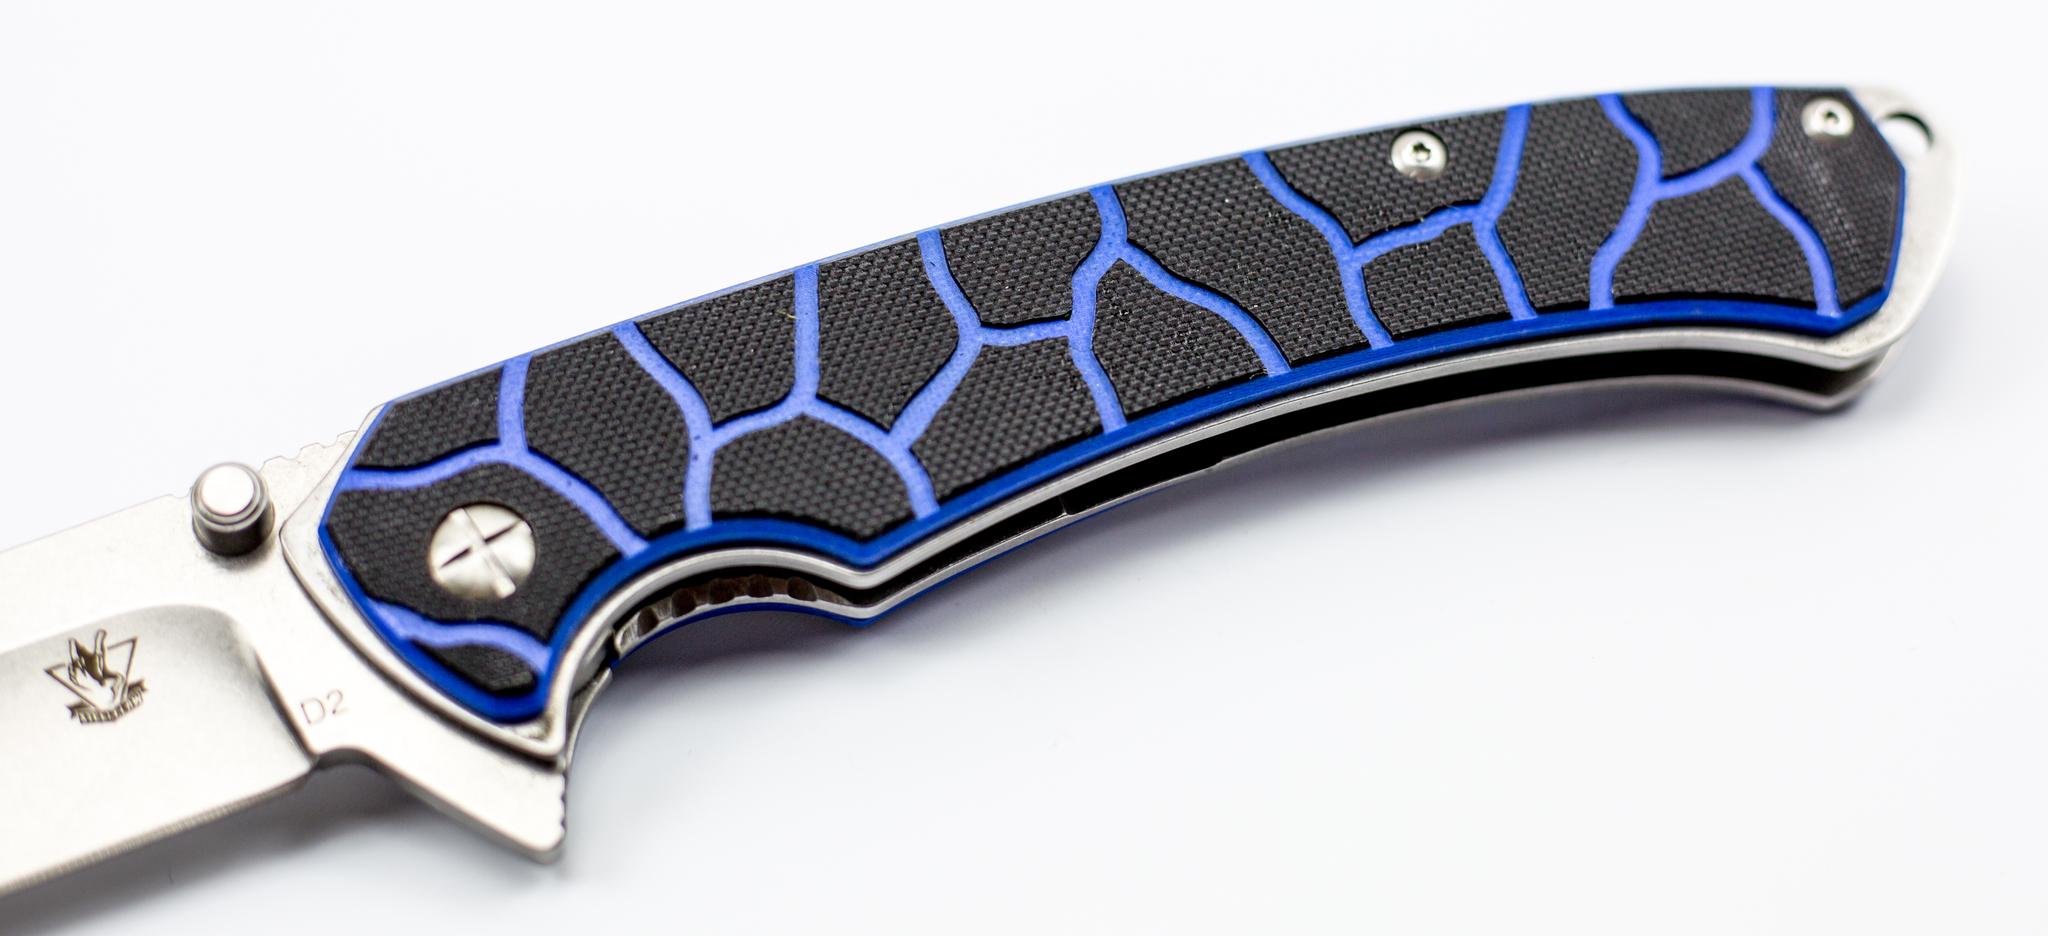 Фото 10 - Нож Лед-2, D2 от Steelclaw